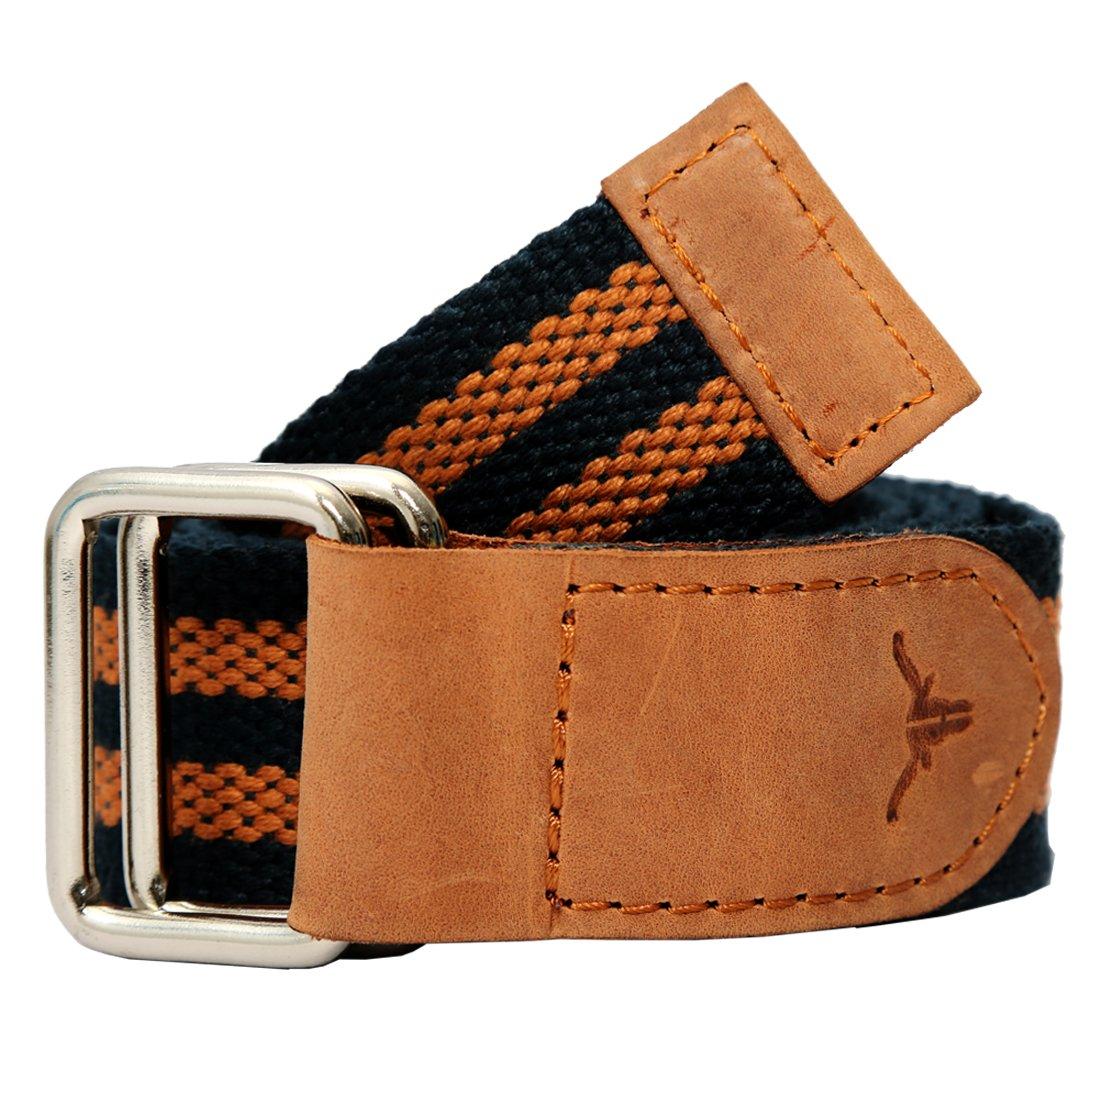 Hidekraft Unisex Canvas Leather Belt  Blue Tan, Free Size  Men's Belts